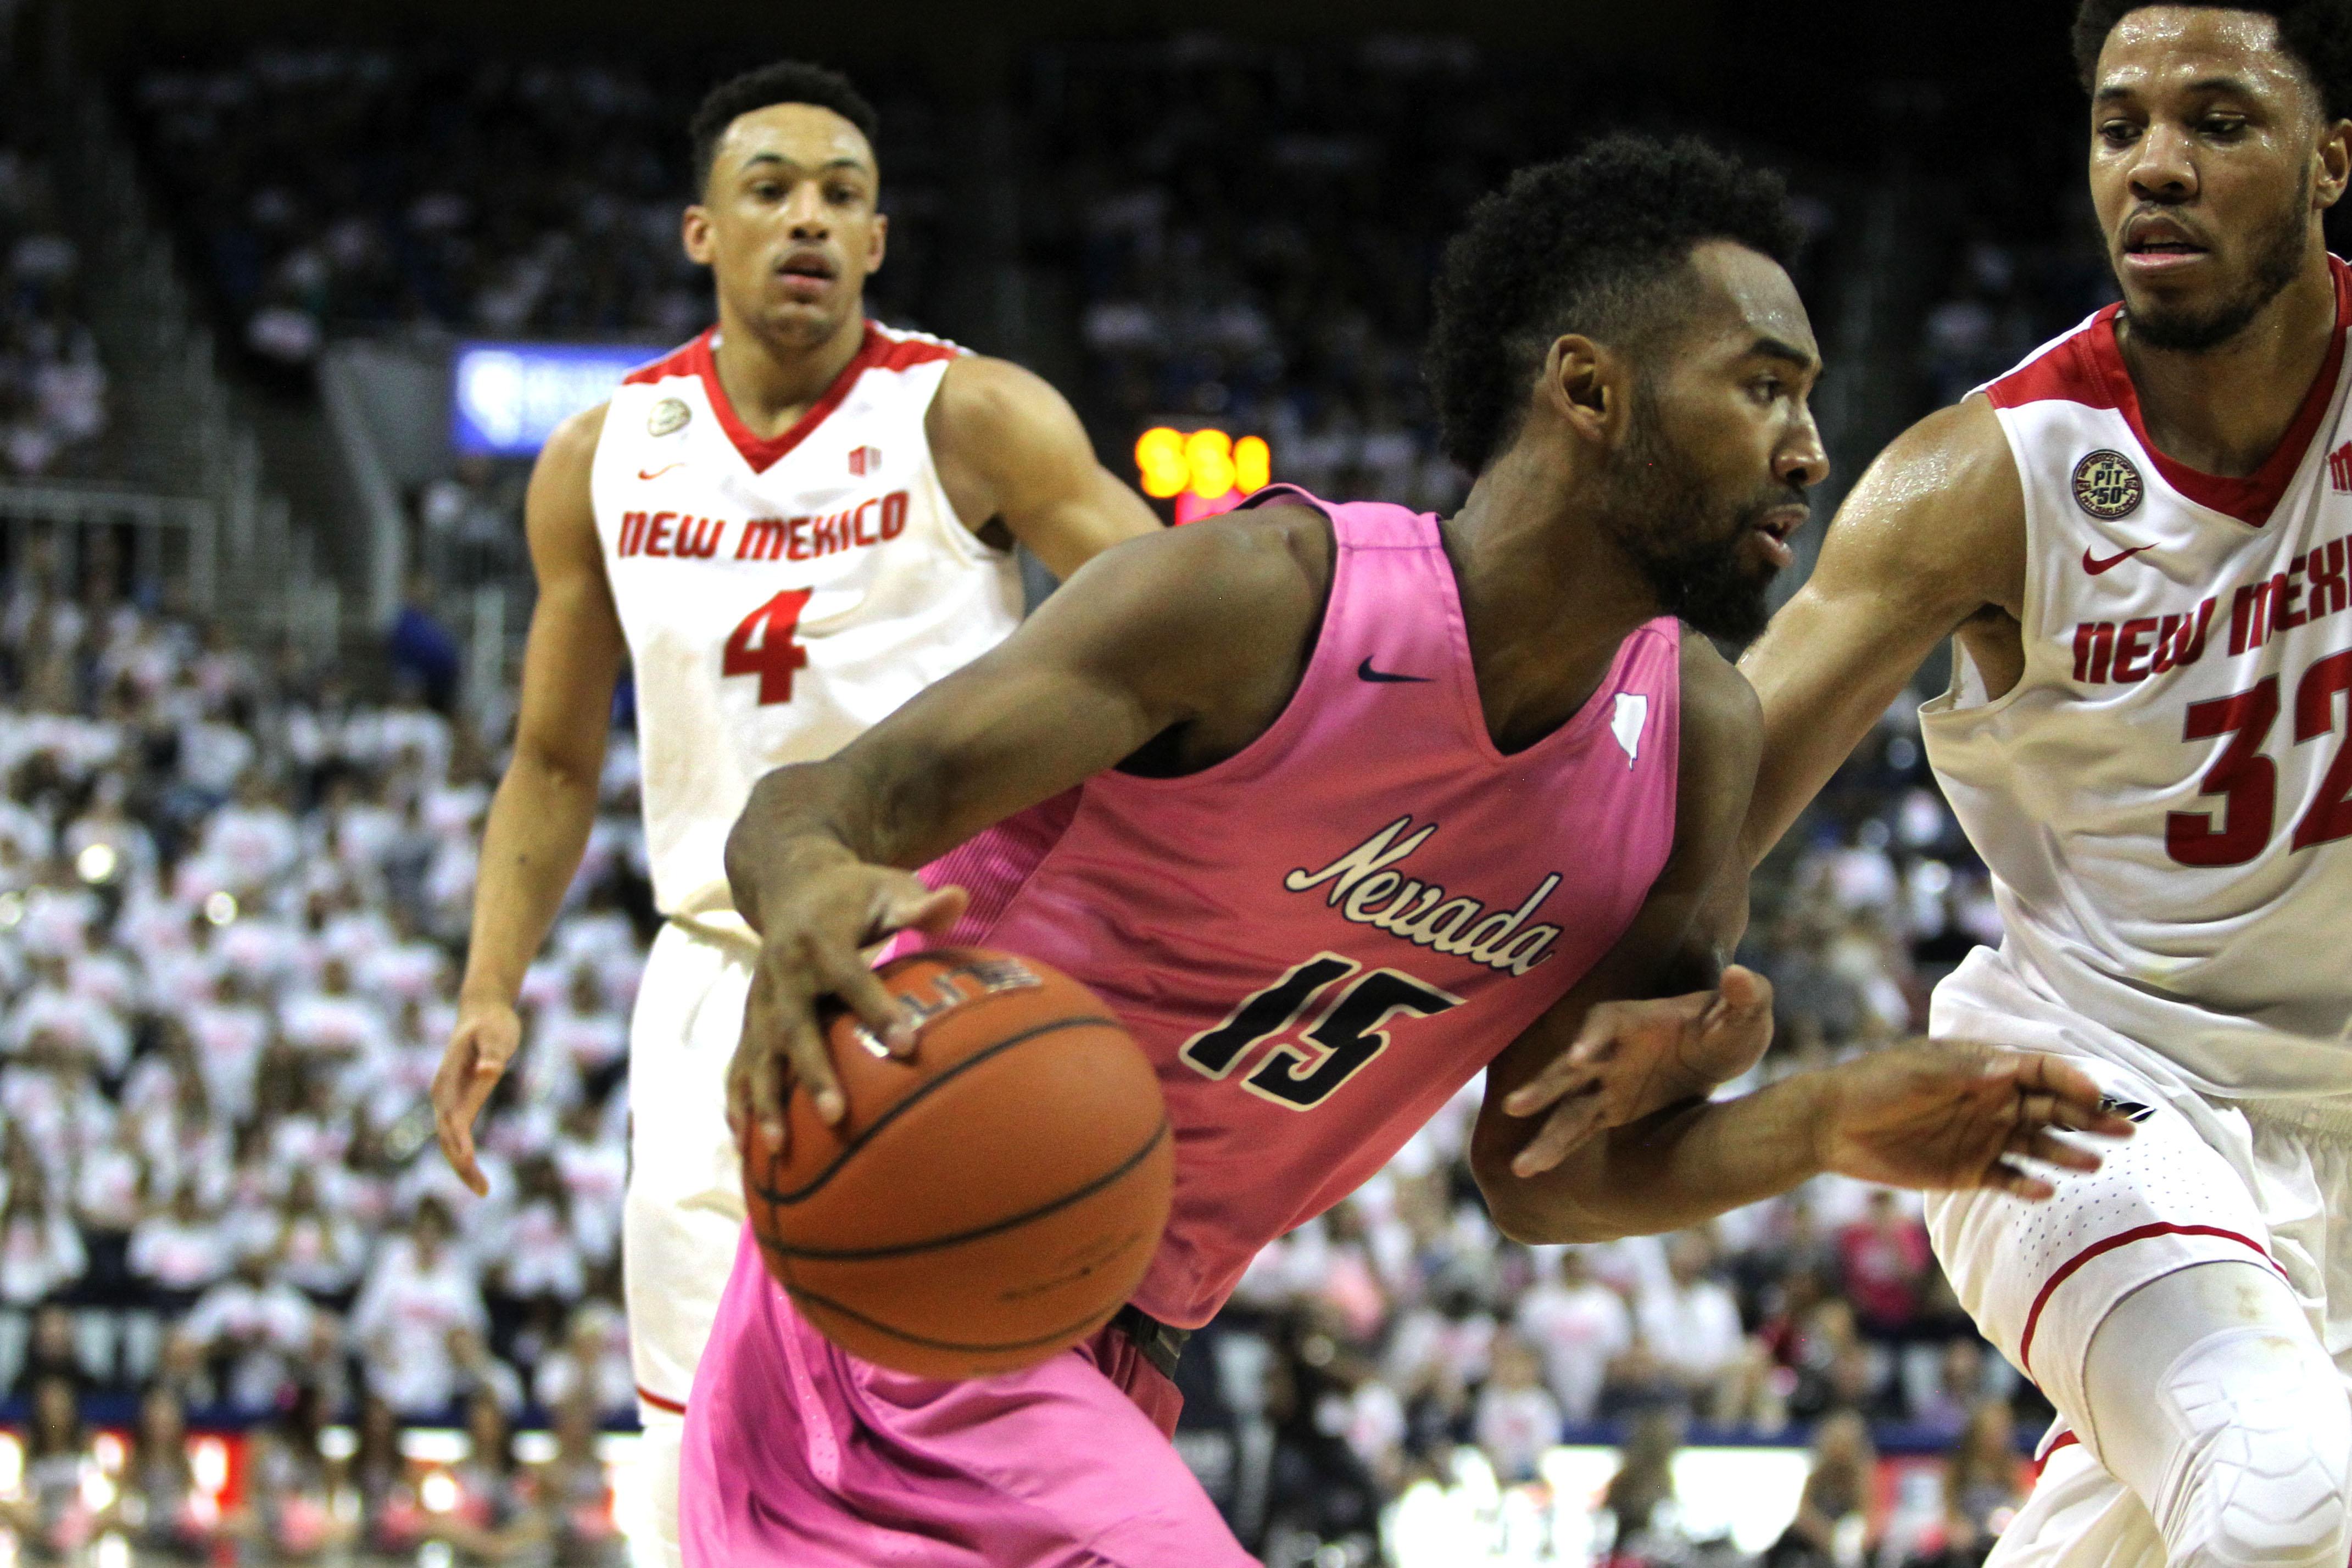 NCAA Basketball: New Mexico at Nevada